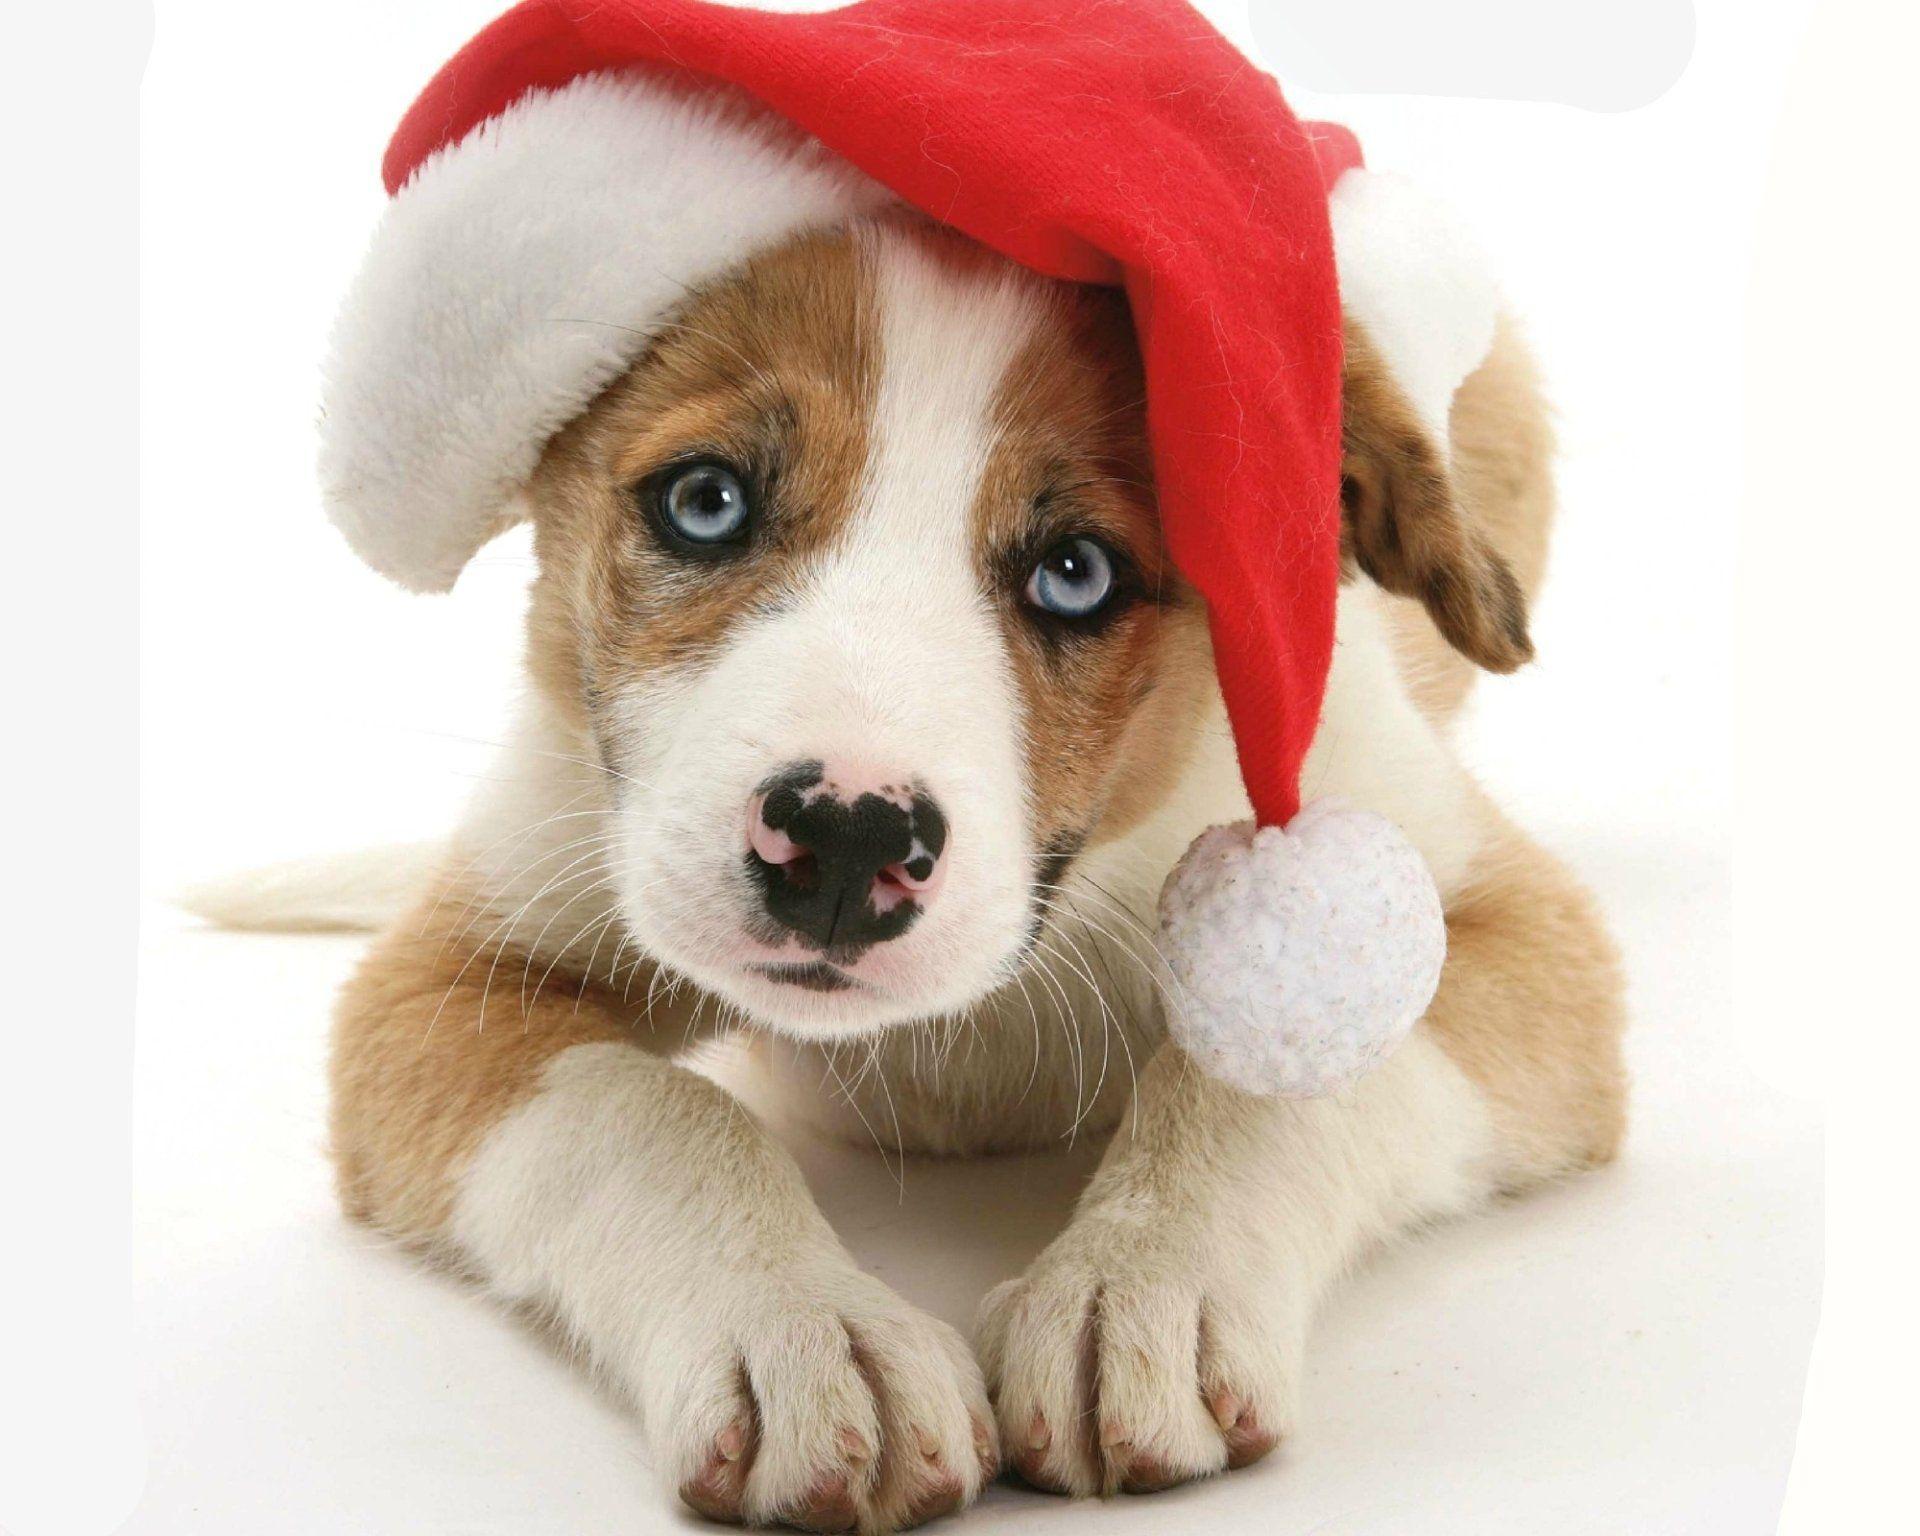 Christmas Puppy Wallpaper Puppy Wallpaper Dog Wallpaper Christmas Puppy